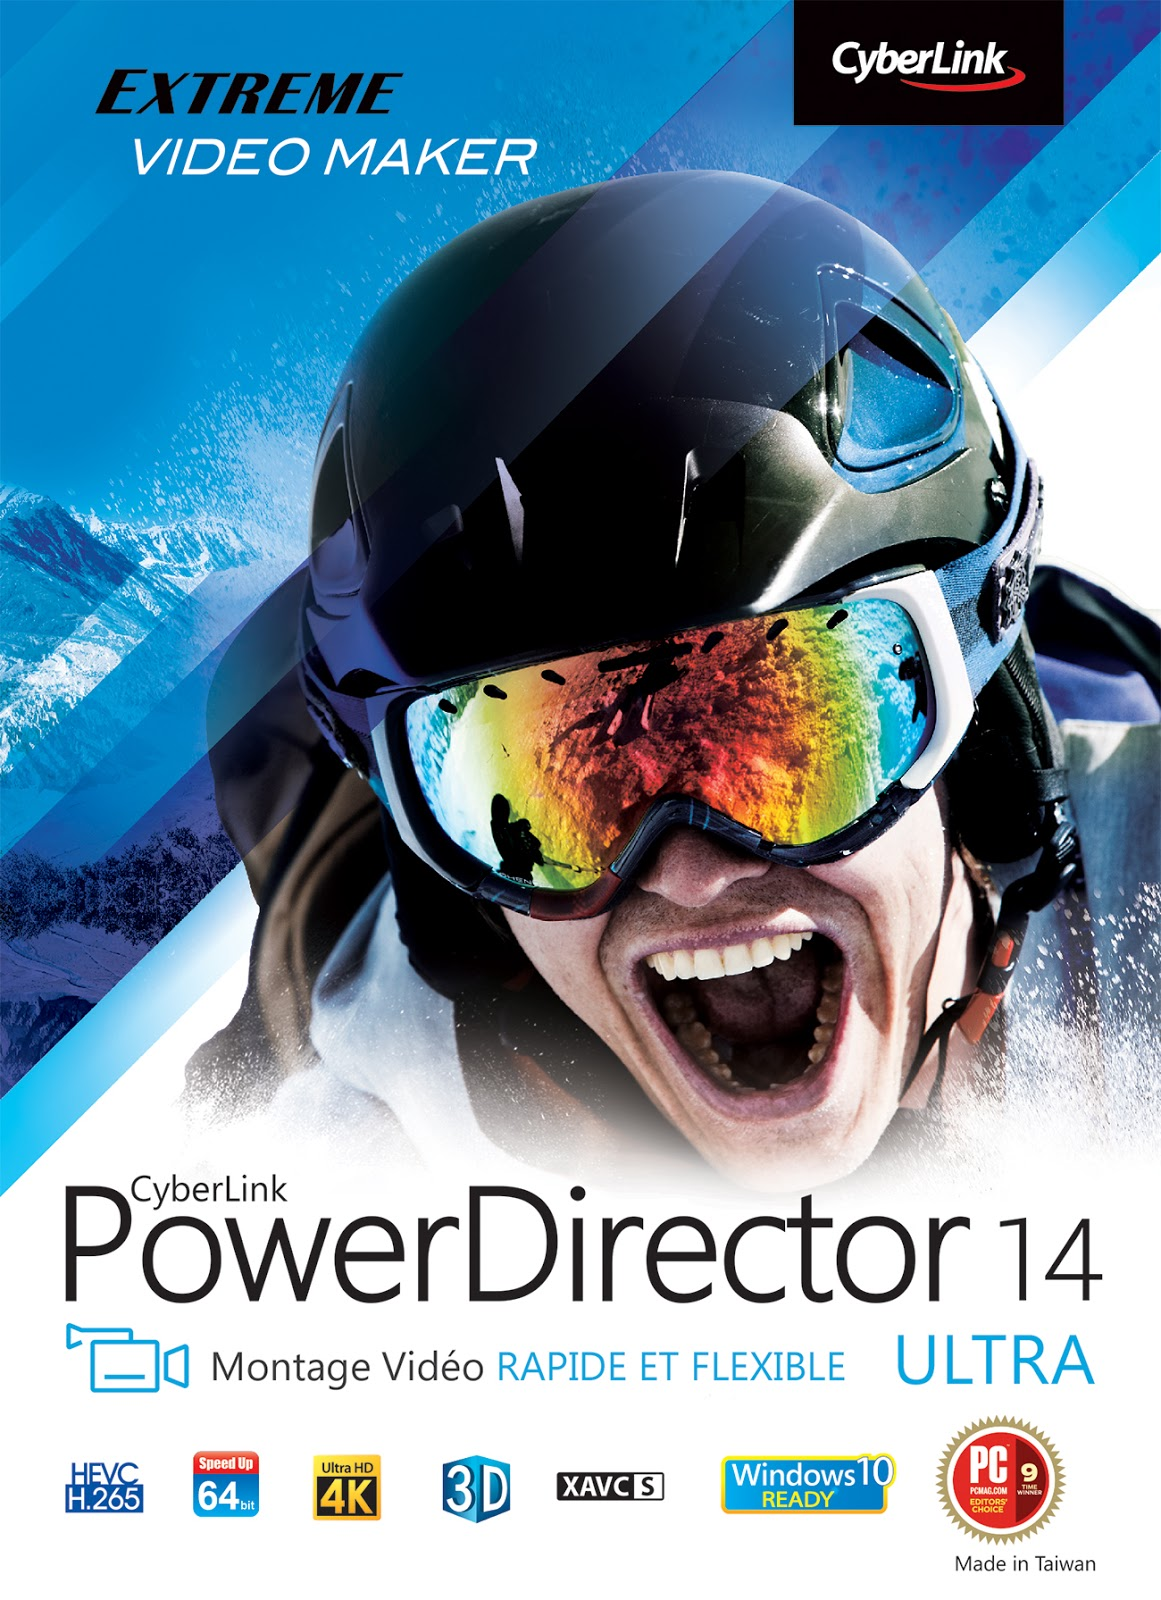 PowerDirector 14 Ultra Image